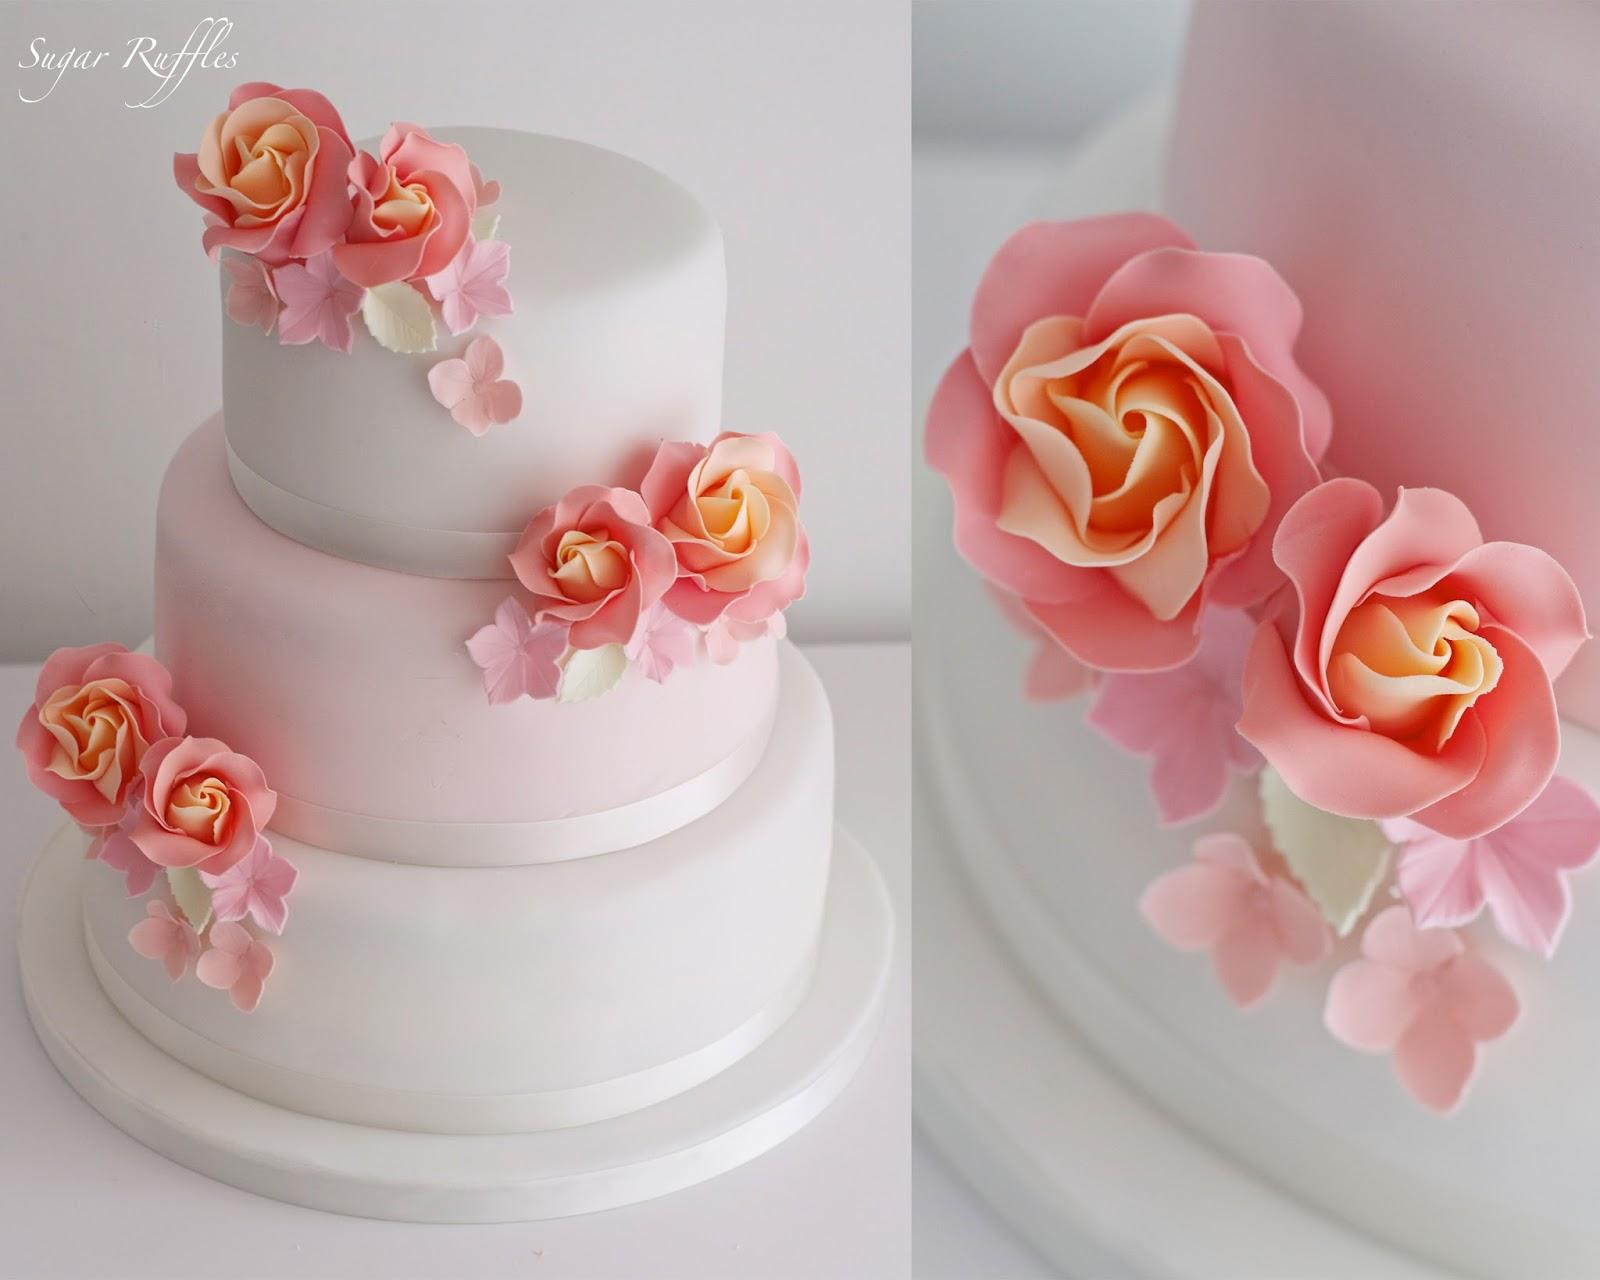 3 Tier Wedding Cakes 61 Cool A tier wedding cake